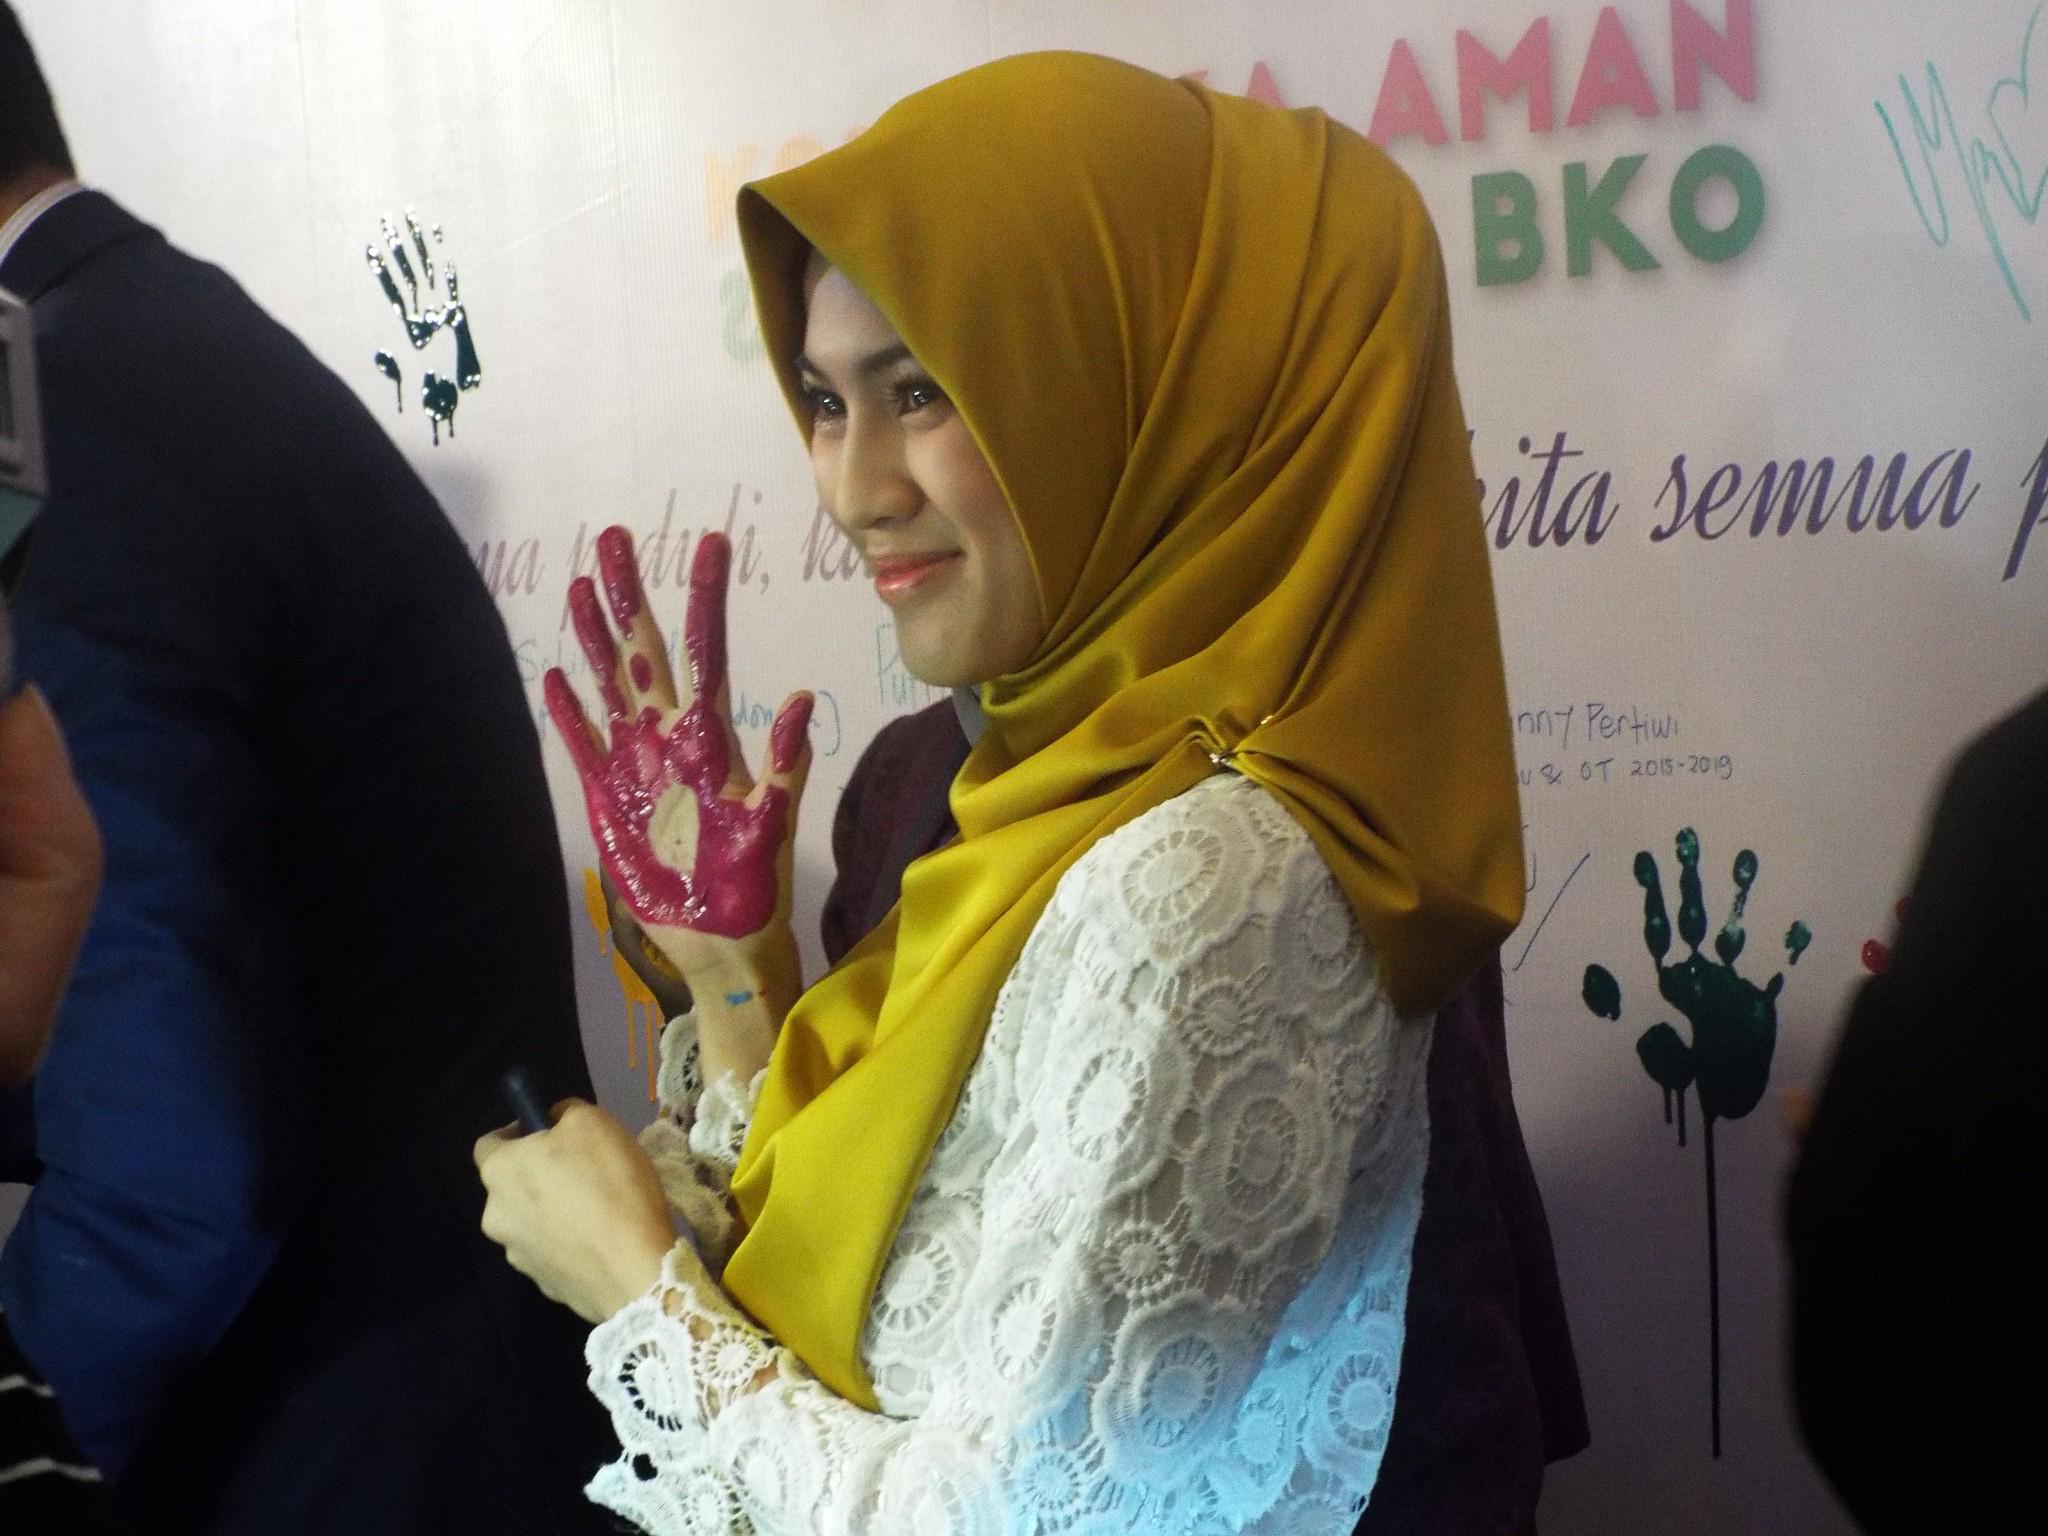 Icha Soebandono juga ikut mendukung aksi peduli